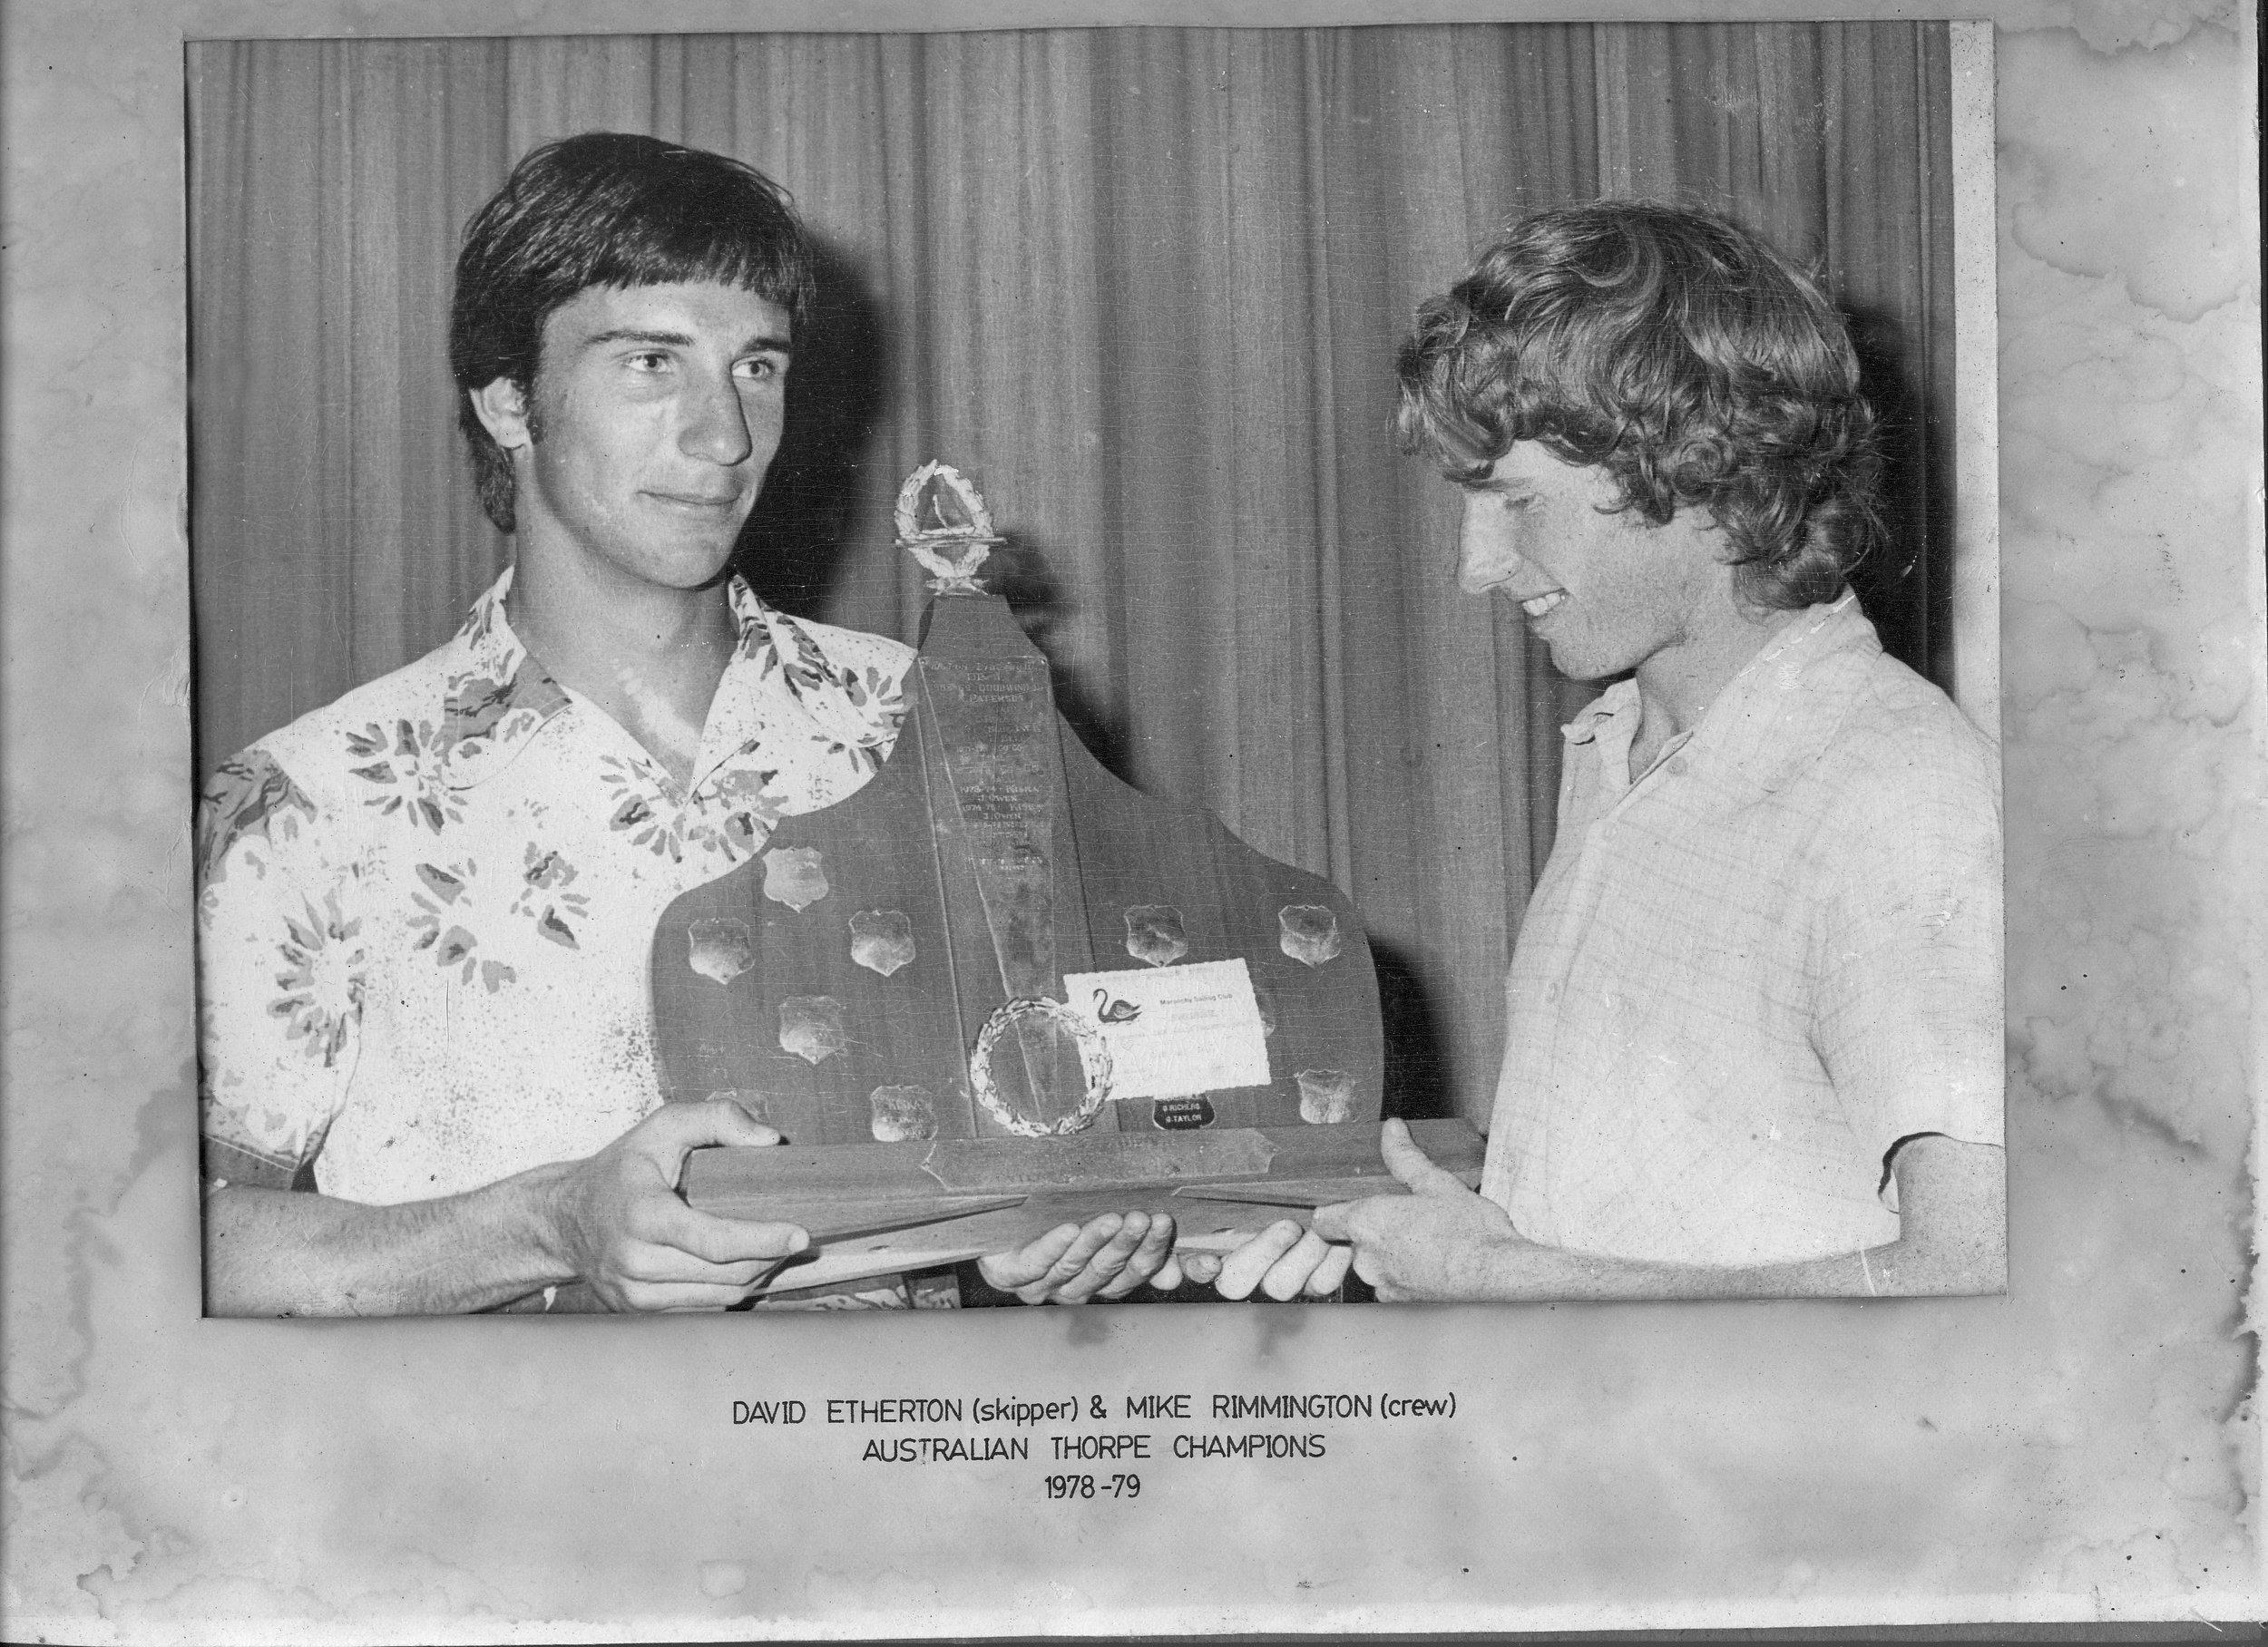 David Etherton & Mike Remminington, Australian Thorpe Champions, 1978